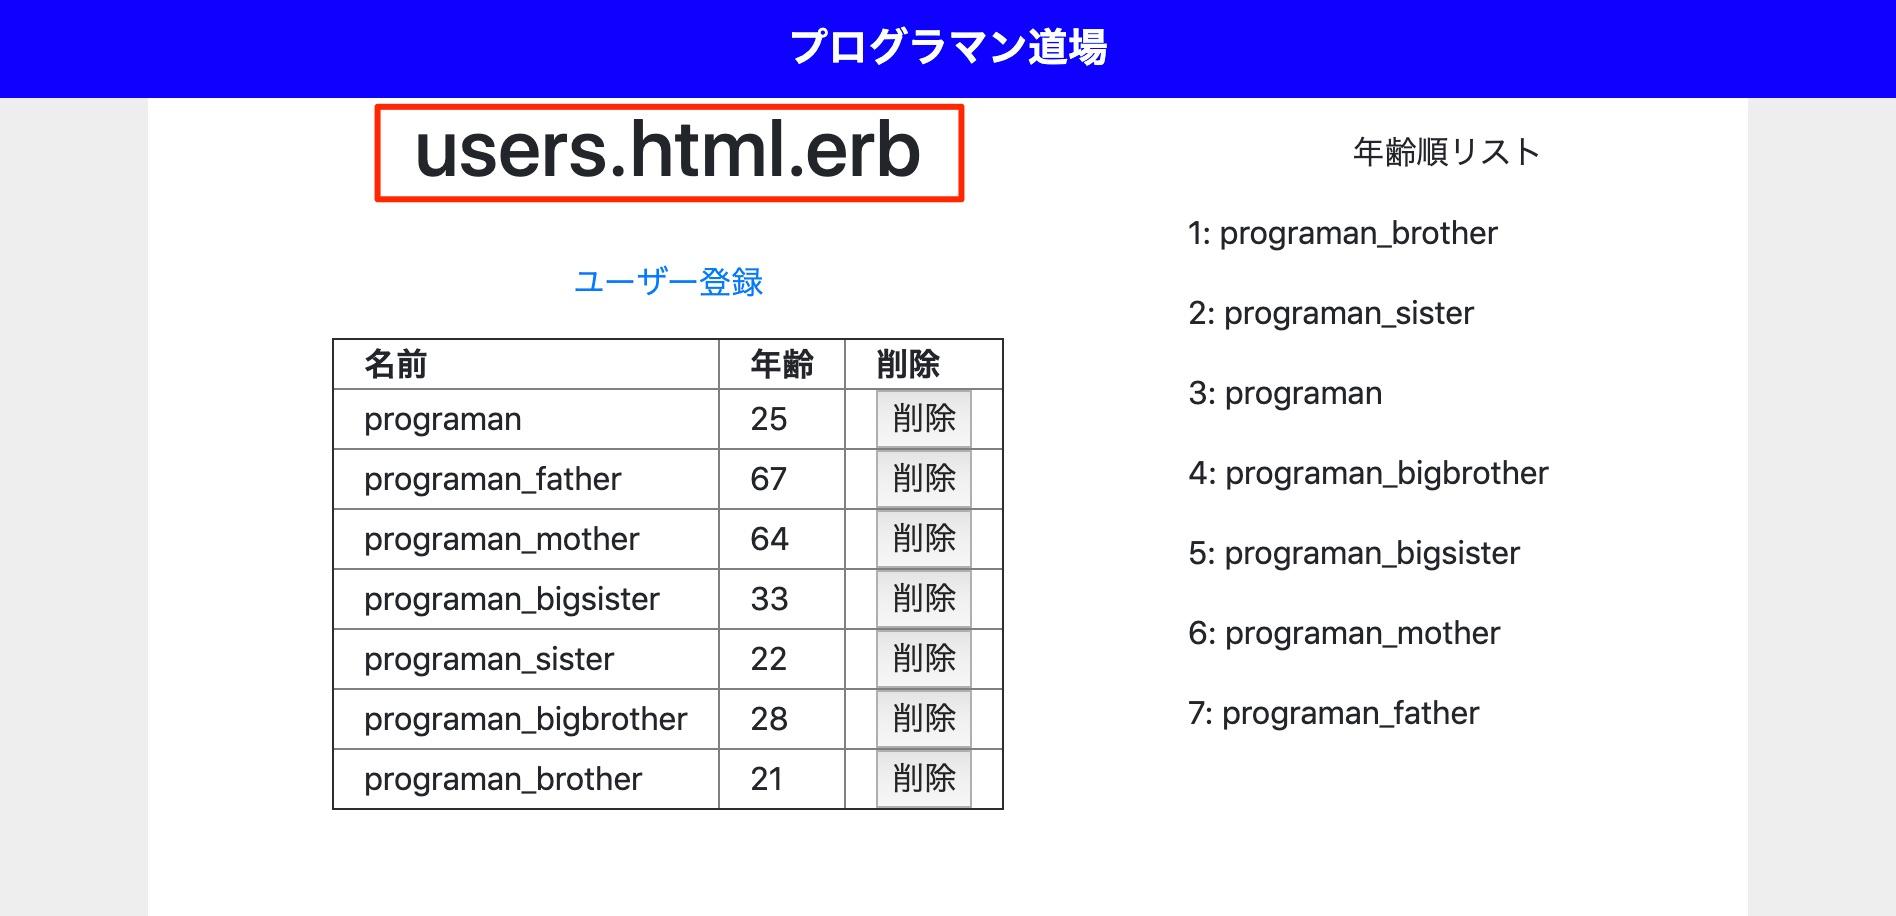 users.html.erbが表示